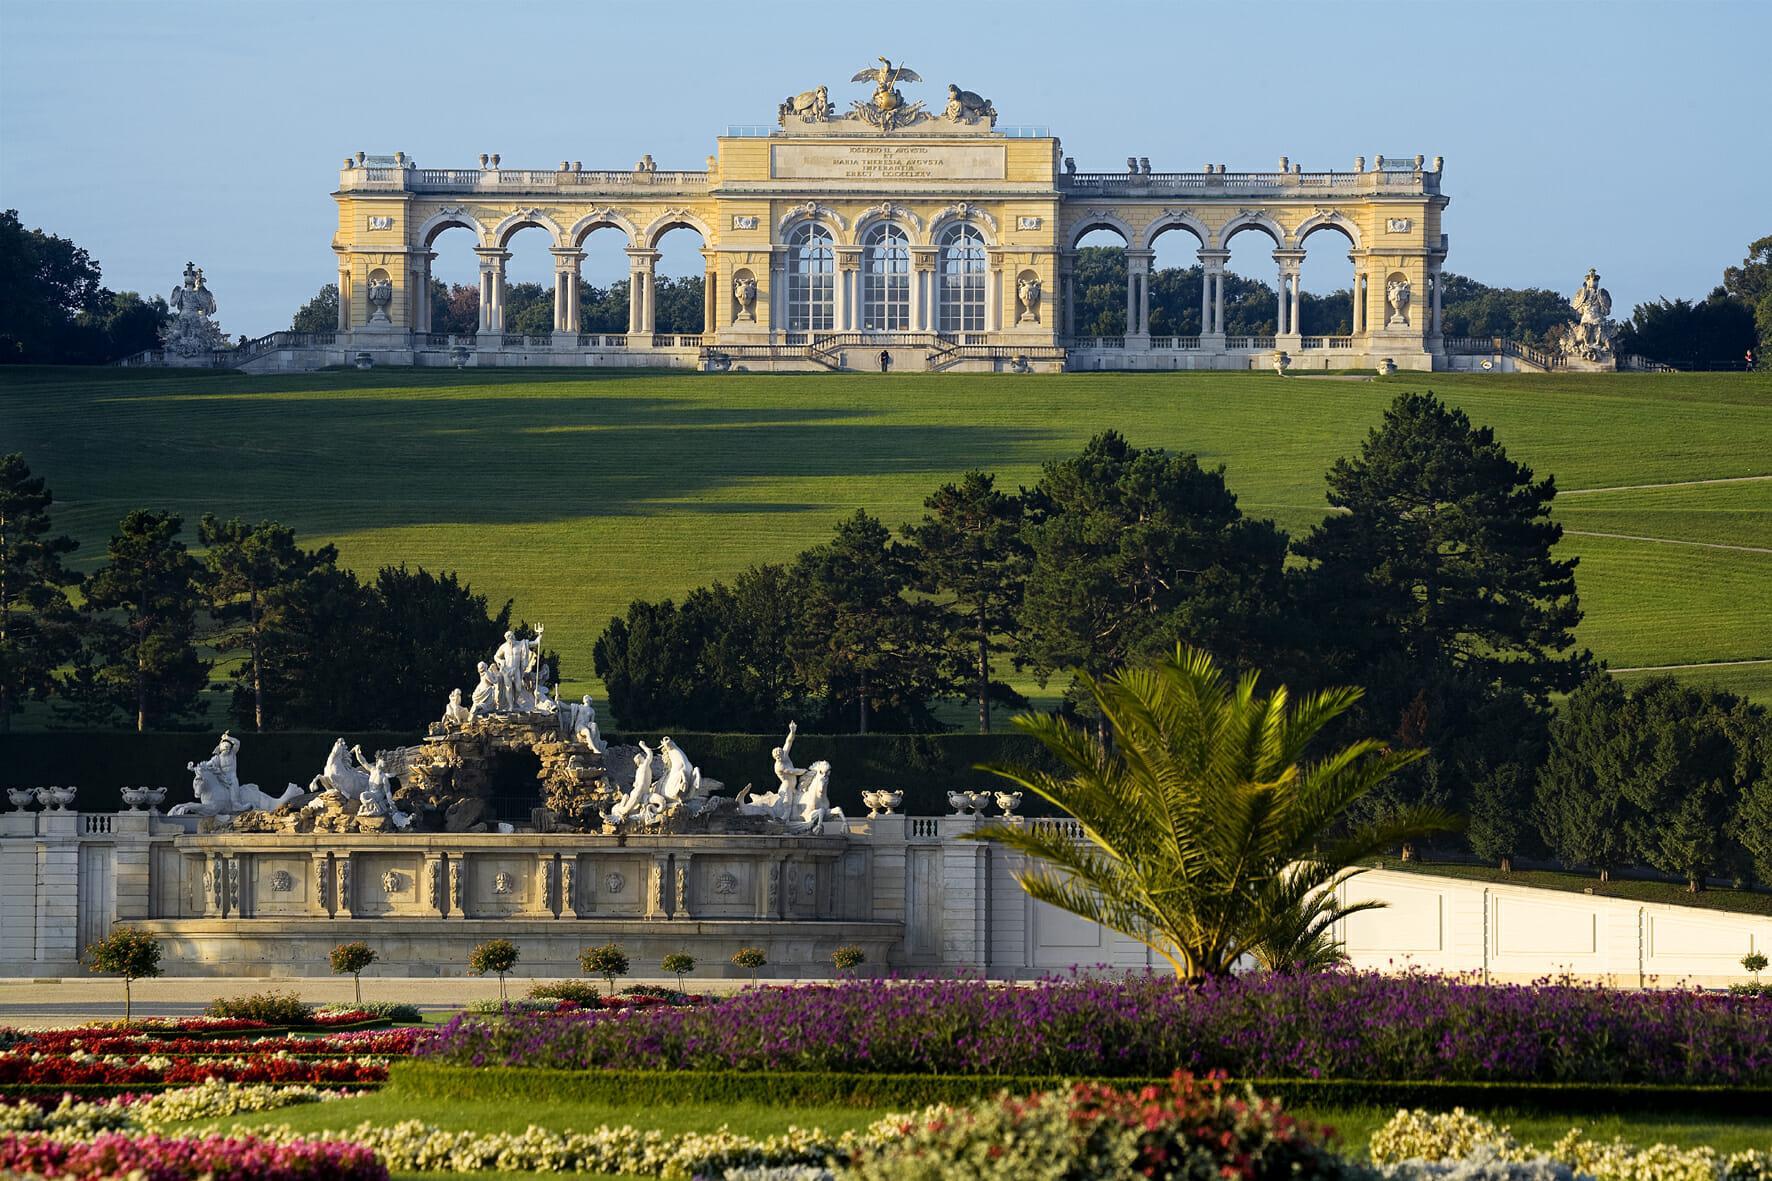 Reiseführer Wien Schloss Schönbrunn Gloriette